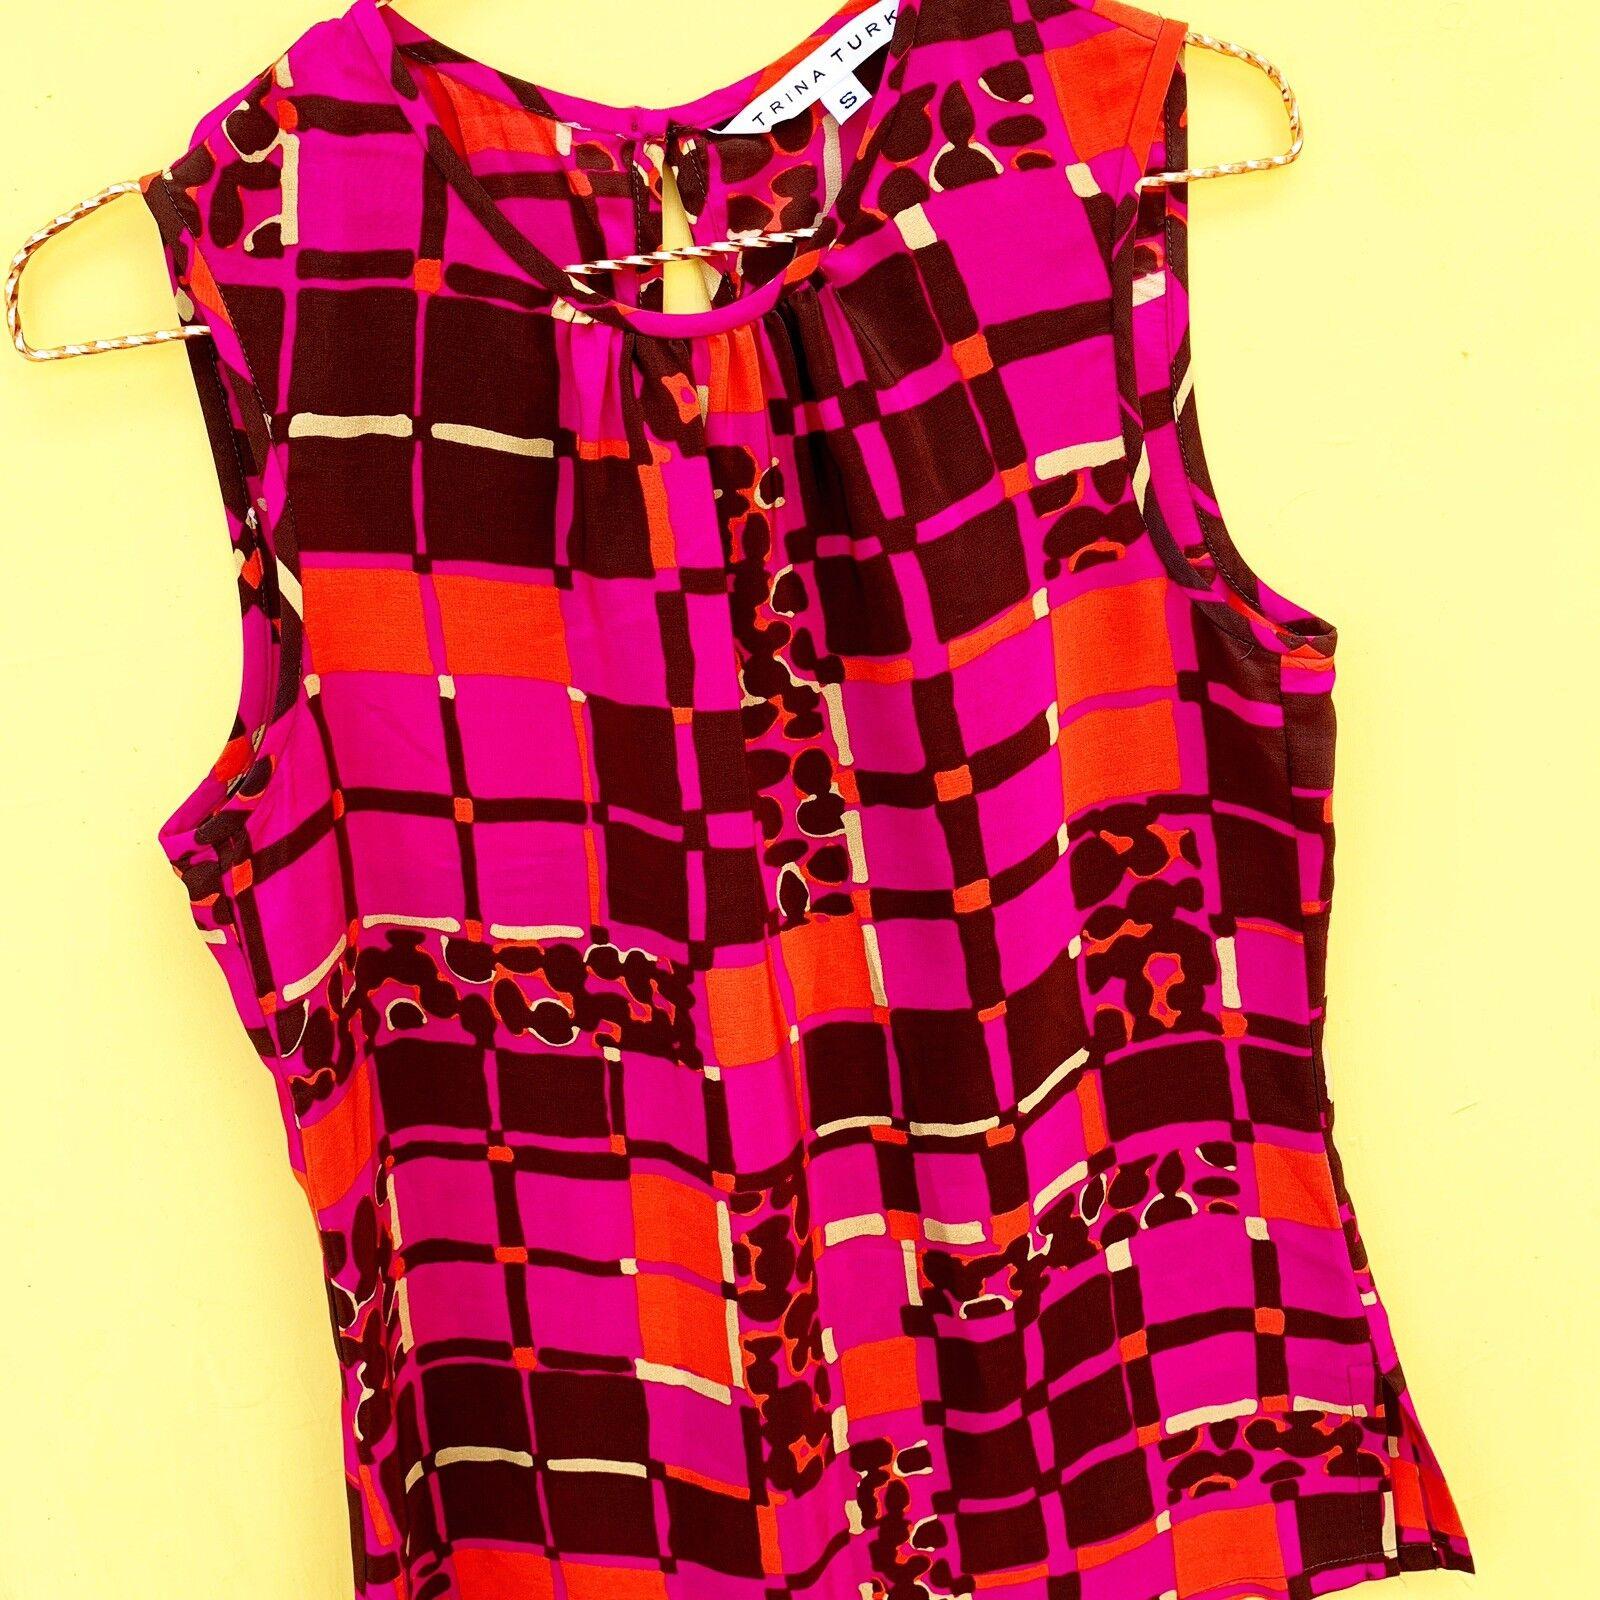 TRINA TURK silk sleeveless top blouse S abstract geometric print